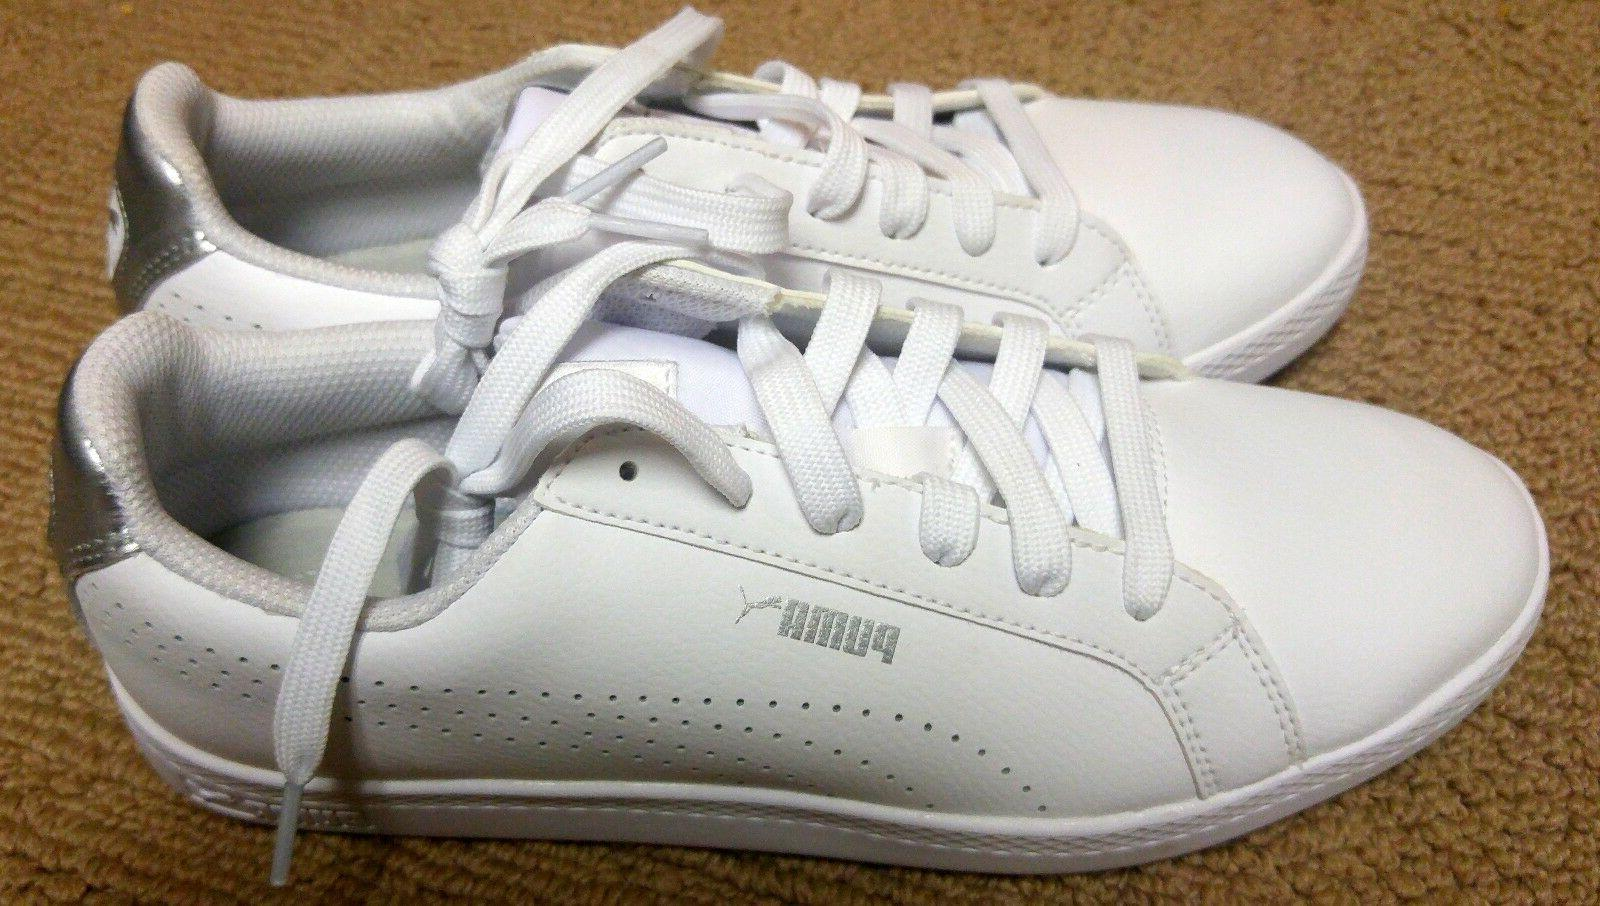 Puma Smash Perf Womens White Leather Sneaker Tennis Shoe No